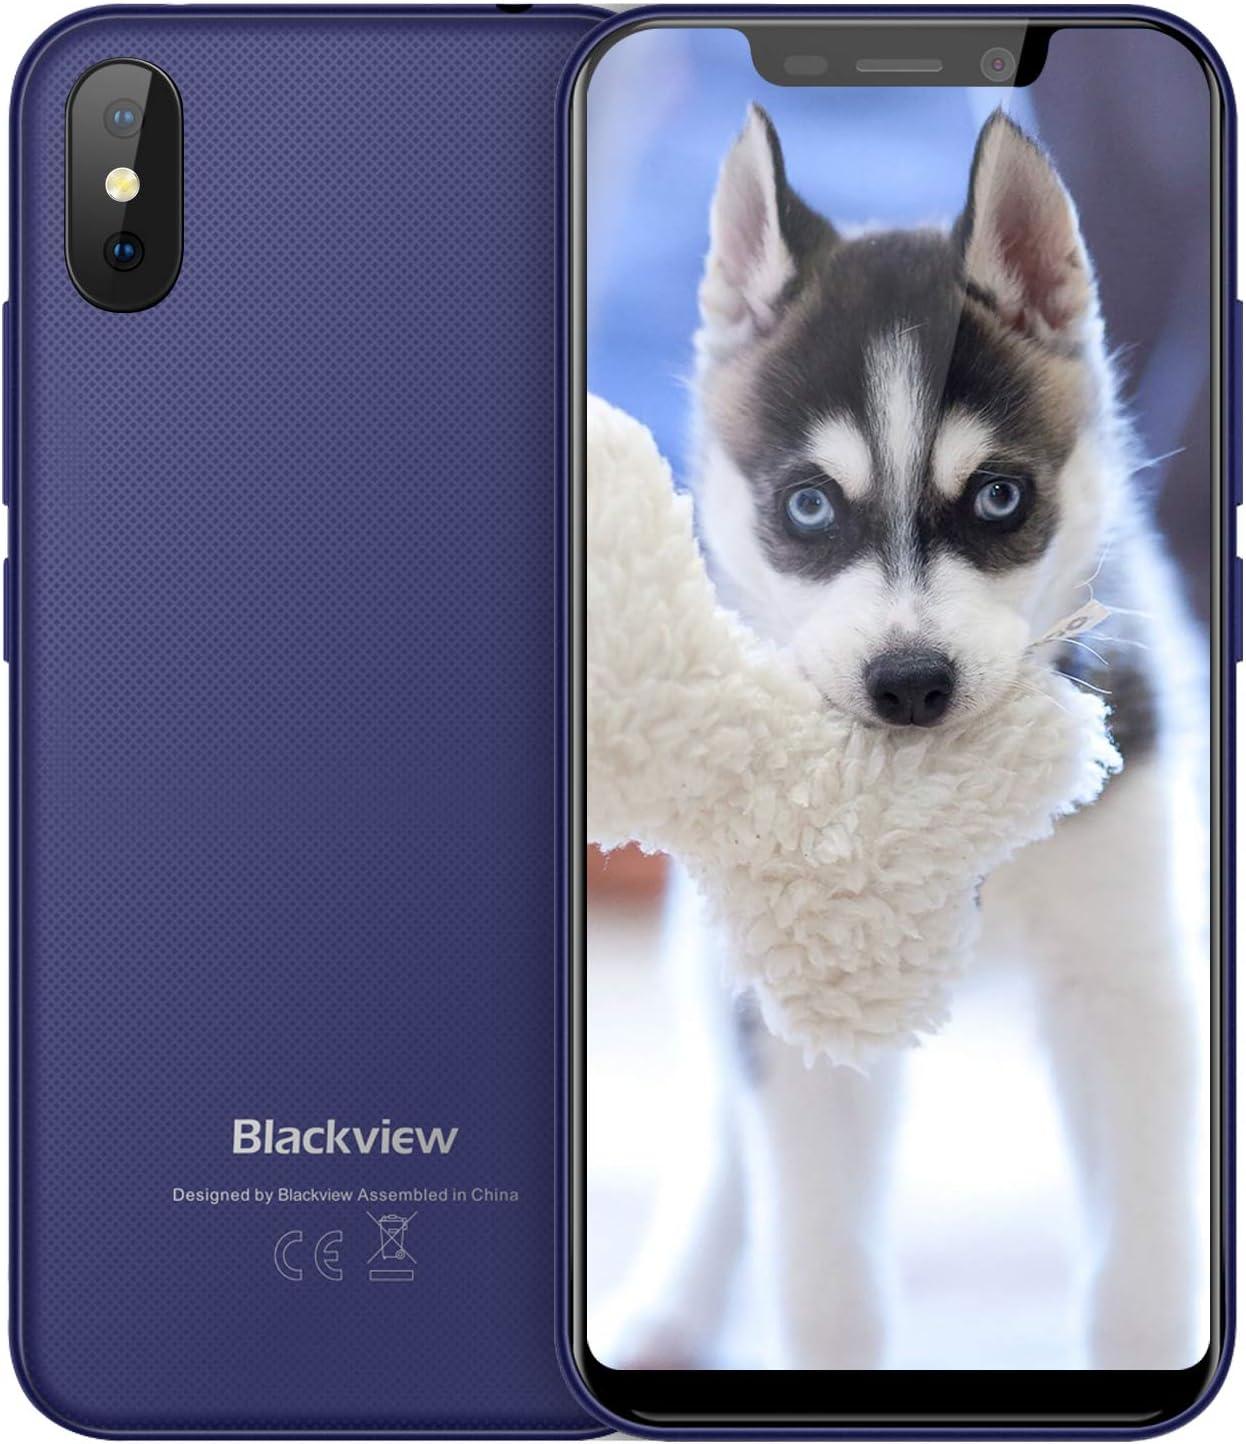 Blackview A30 Telefonos Moviles Smartphone Baratos Dual SIM 5.5 Pulgadas(19: 9) FHD Android 8.1 Desbloqueo Teléfono, 5MP+8MP Cámaras 16GB ROM Face ID 3G Blackview Phone Azul: Amazon.es: Electrónica